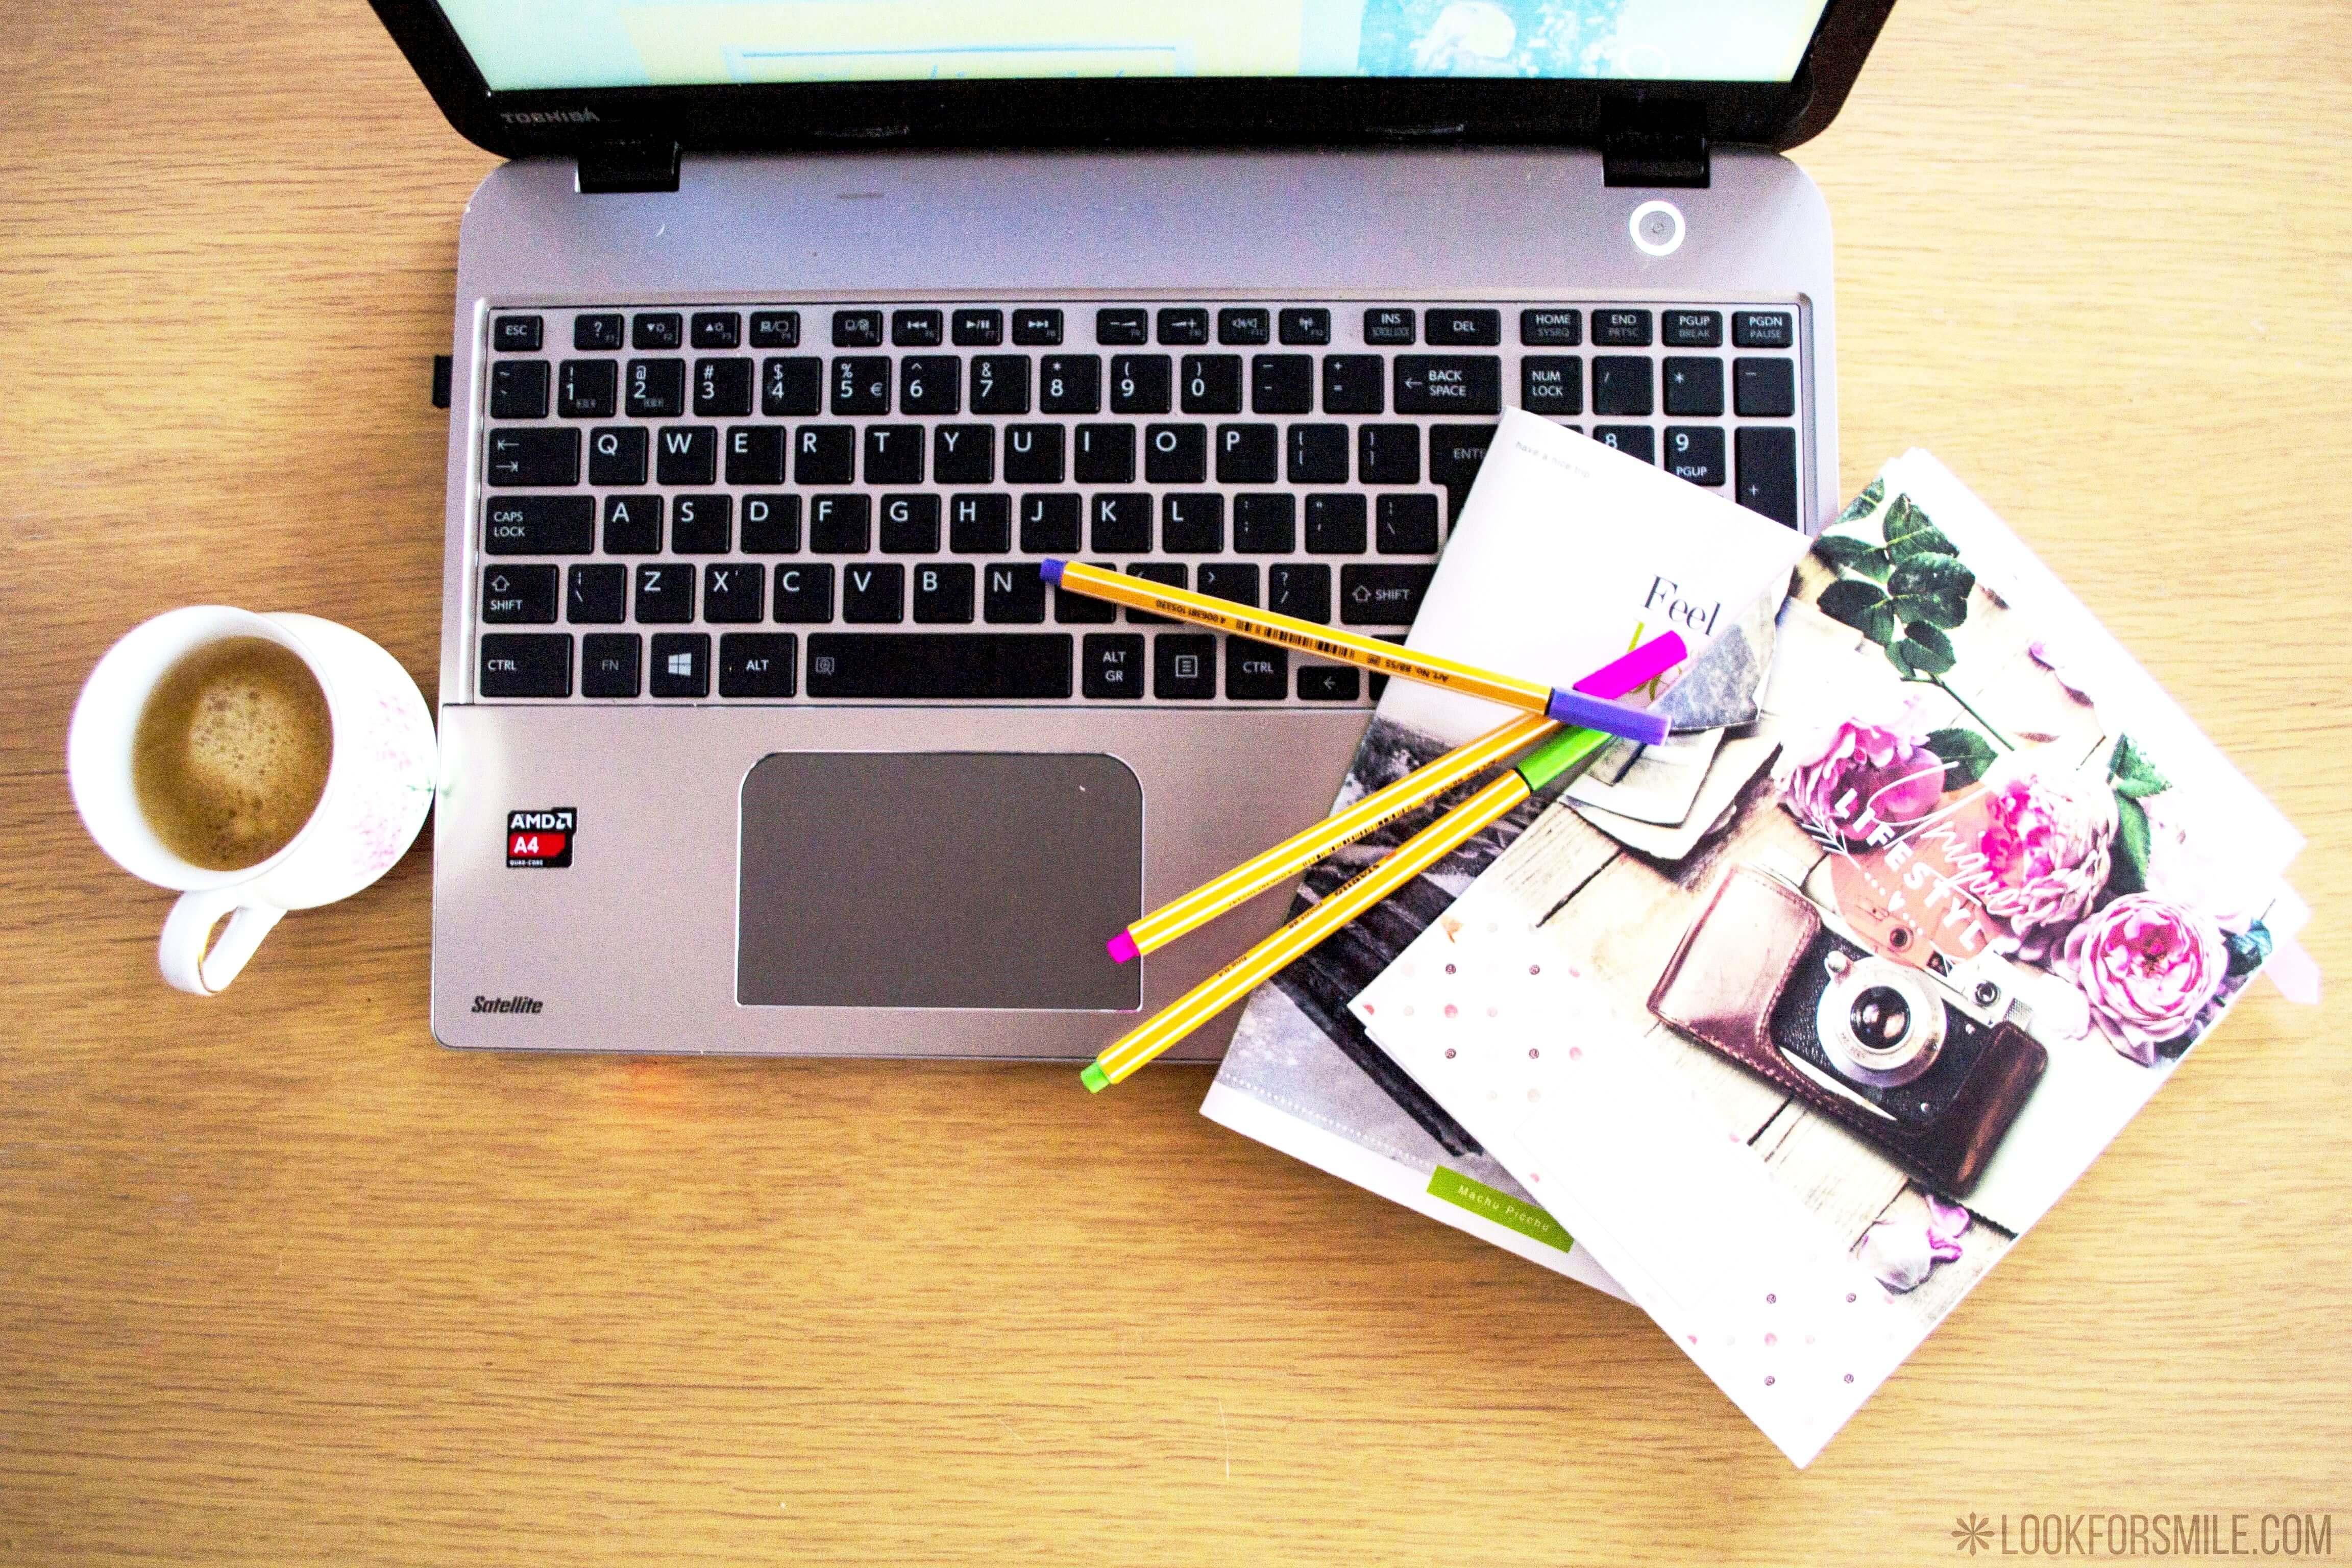 Blogging - blog - Lookforsmile.com